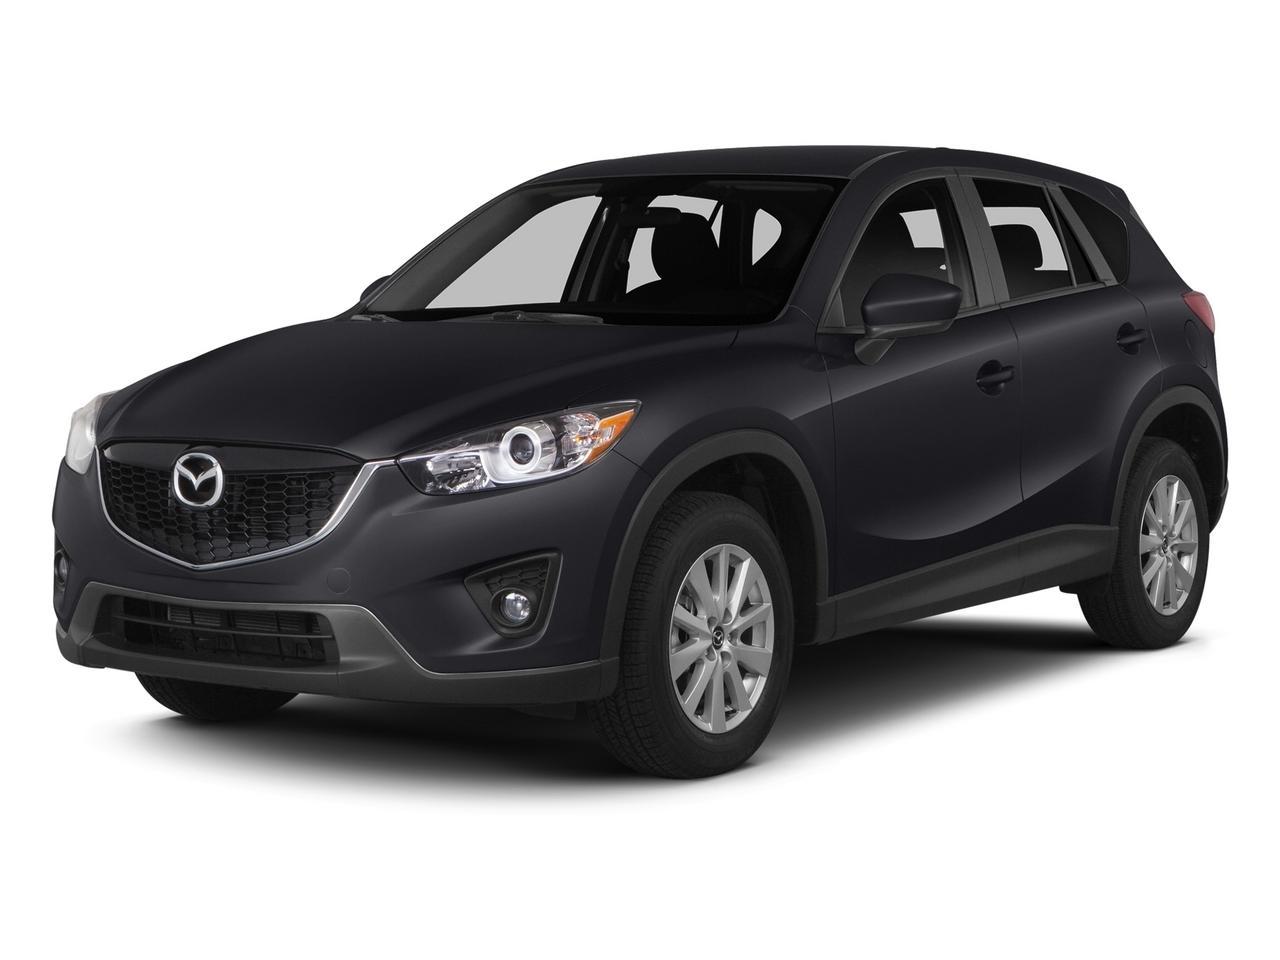 2015 Mazda CX-5 Vehicle Photo in Milford, OH 45150